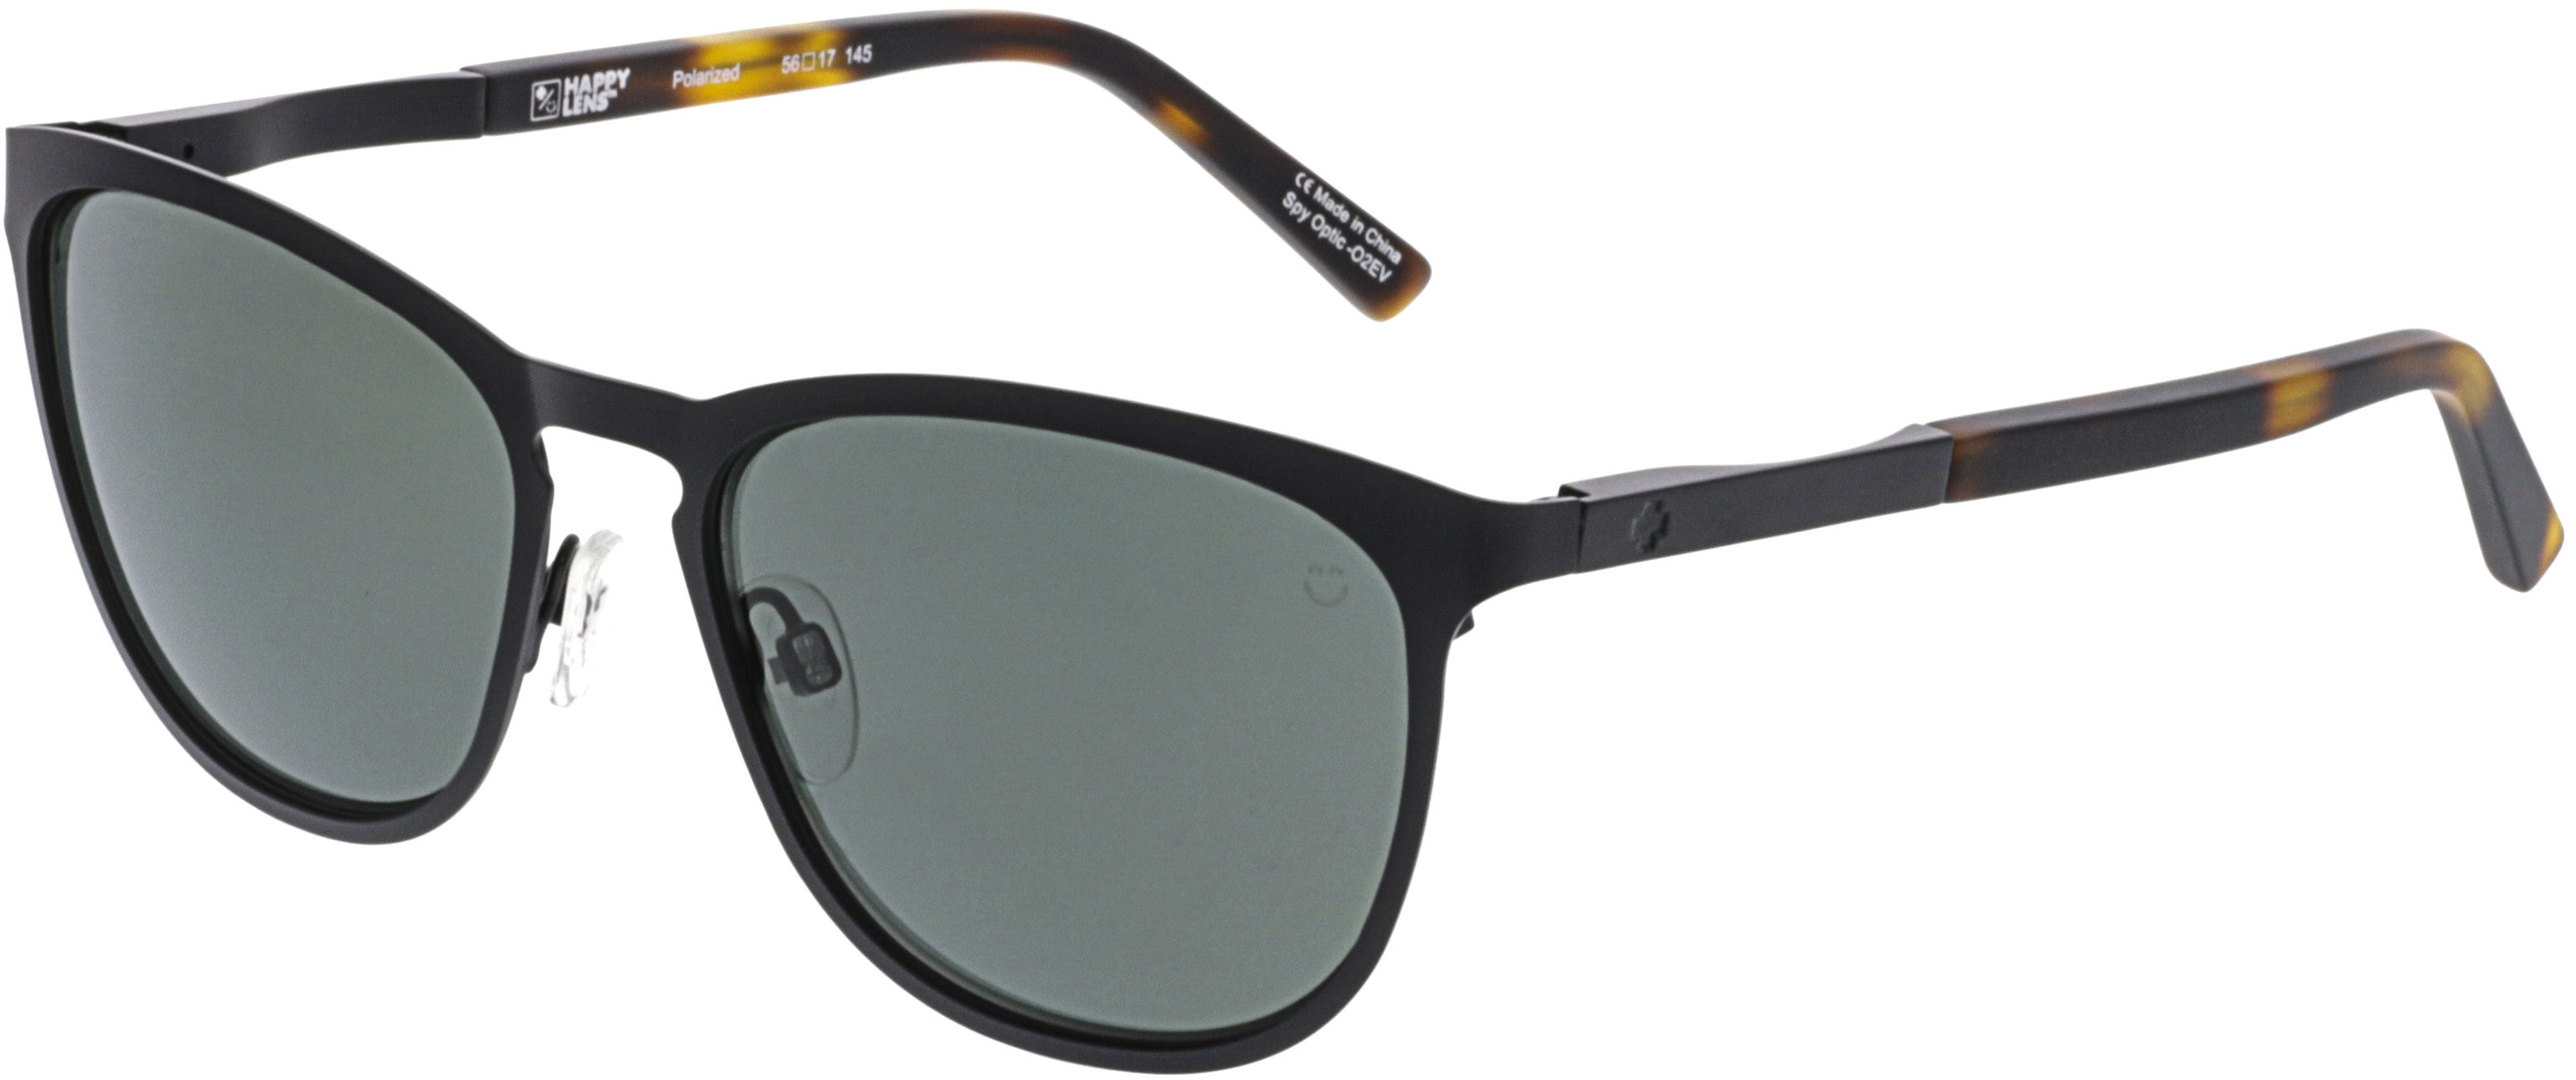 4b96afbc62d3e Details about NEW Spy Optics Cliffside Matte Black   Happy Gray Green  873500764864 Sunglasses